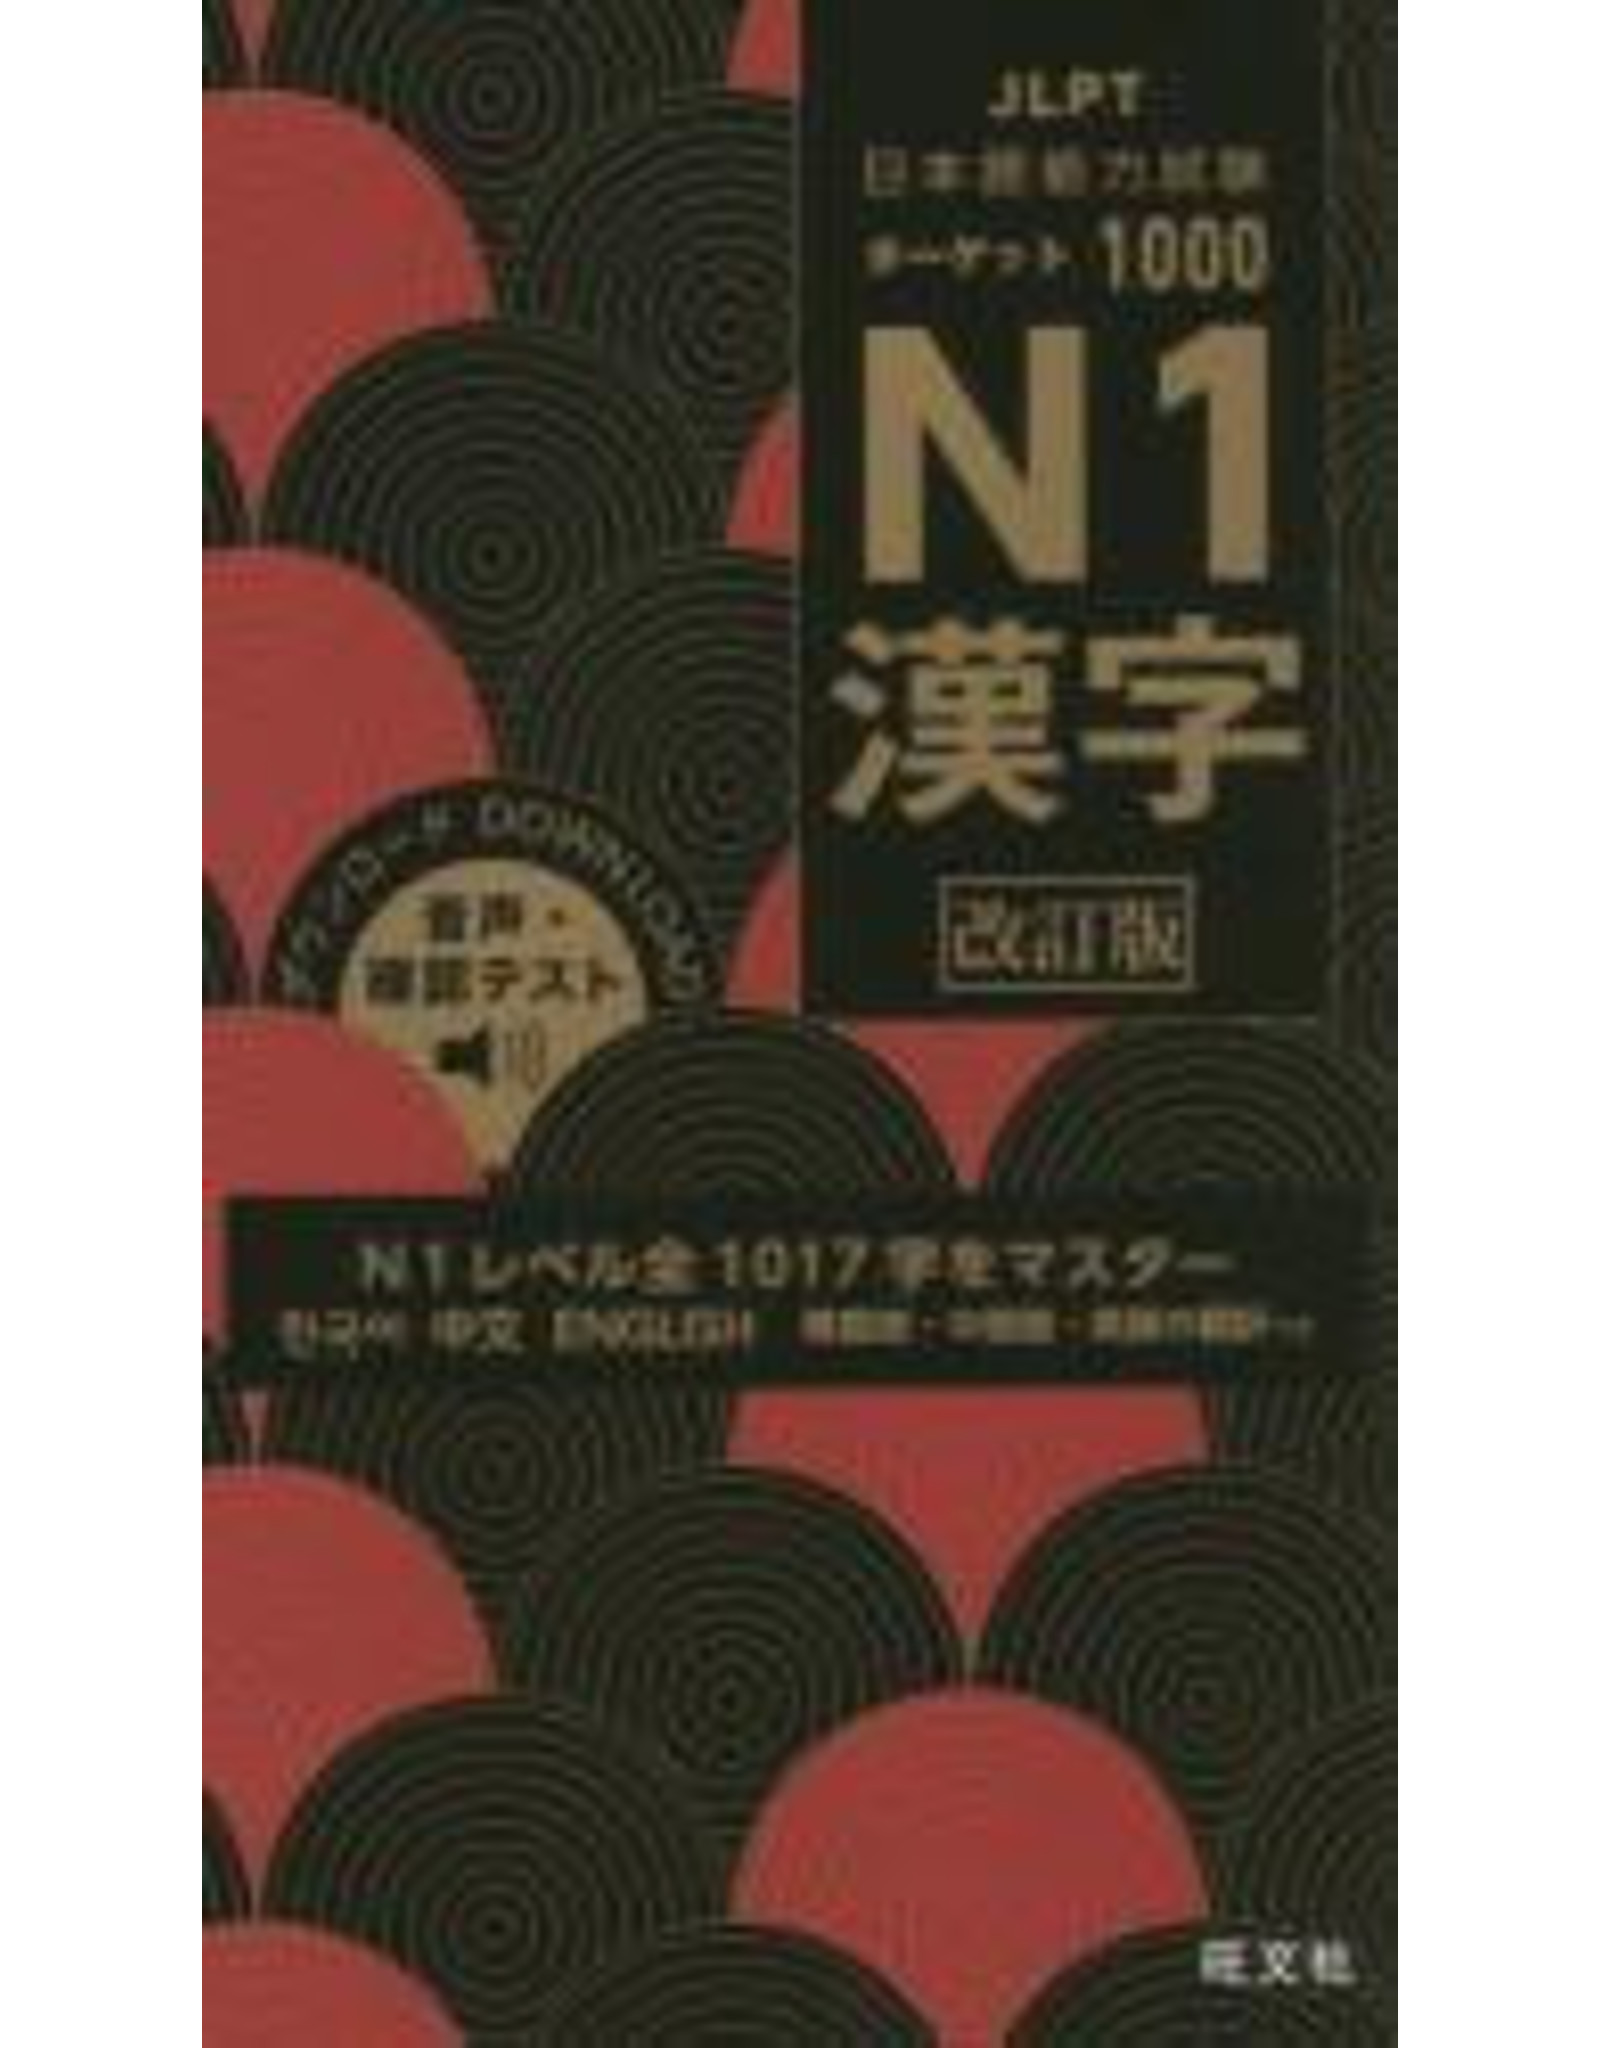 JLPT TARGET 1000 N1 KANJI REVISED EDITION